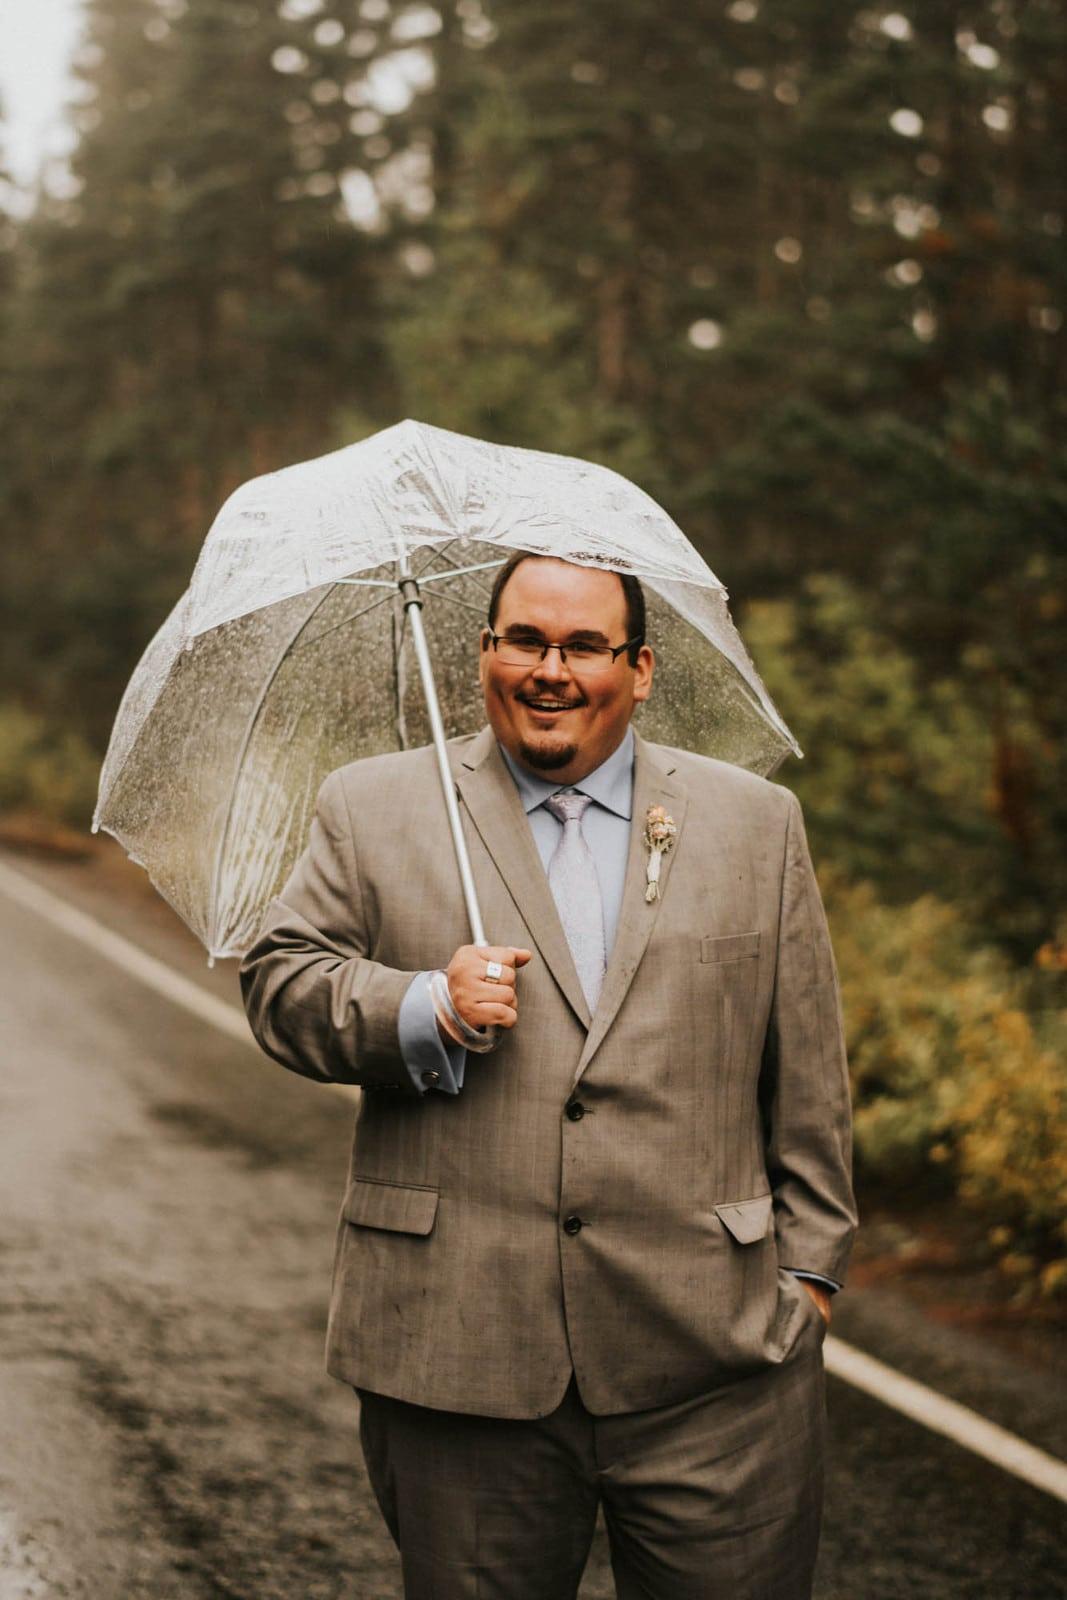 Groom standing with umbrella